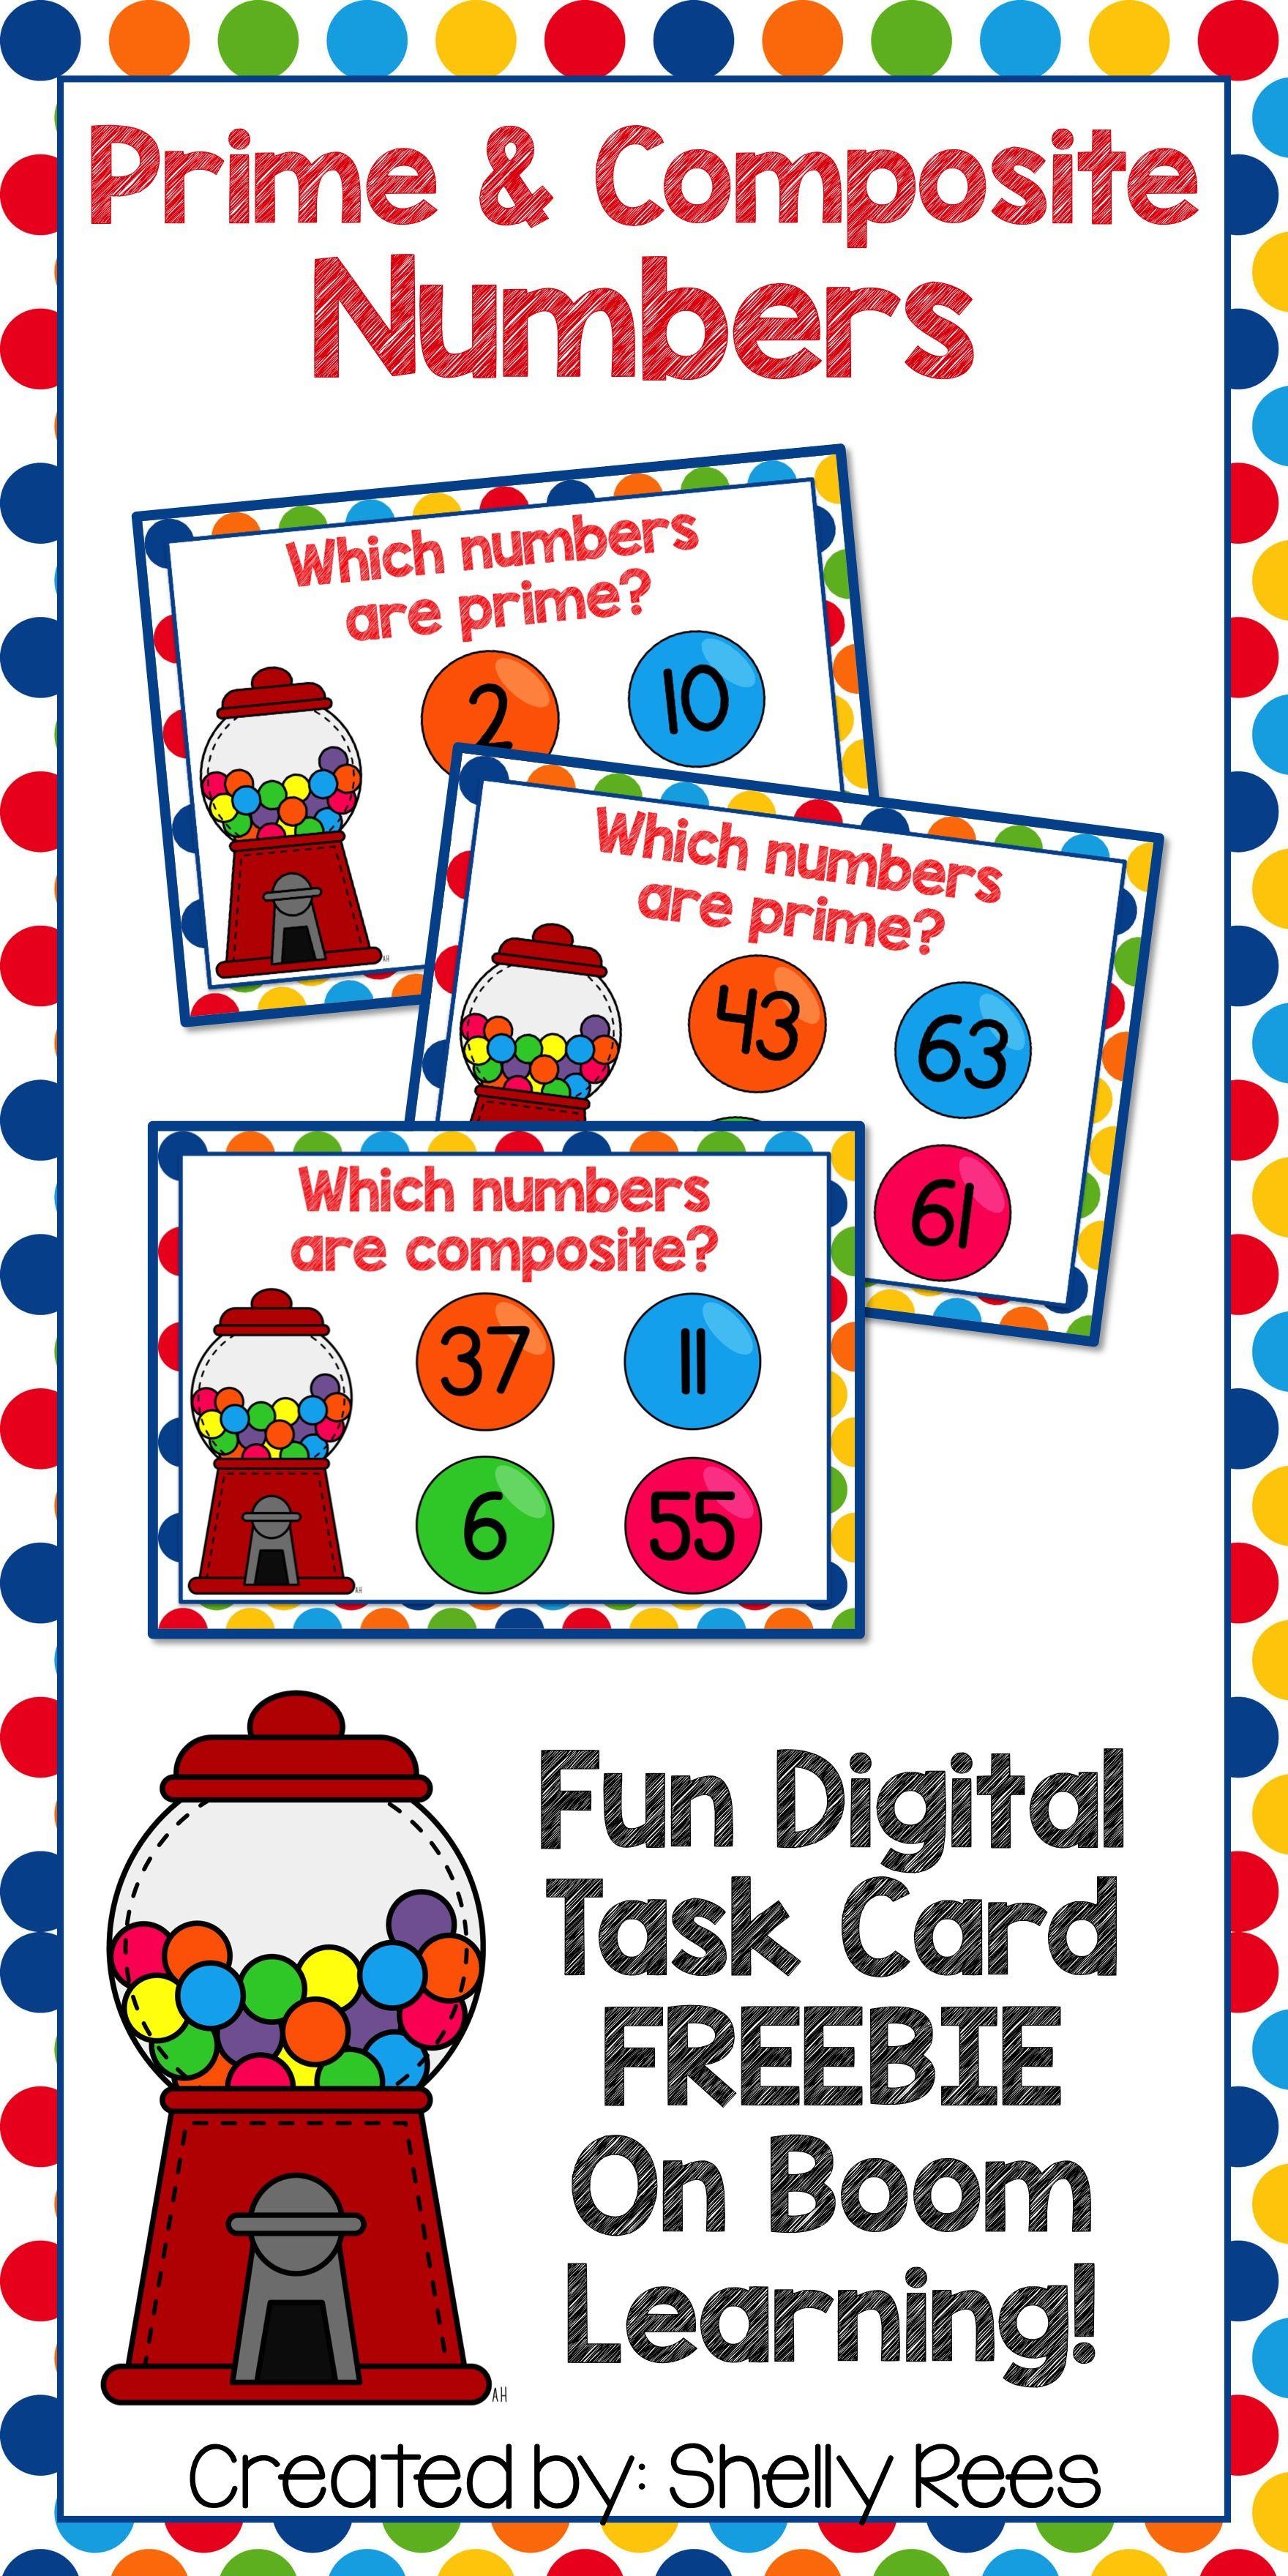 16 Prime And Composite Numbers Worksheets Esl Worksheets